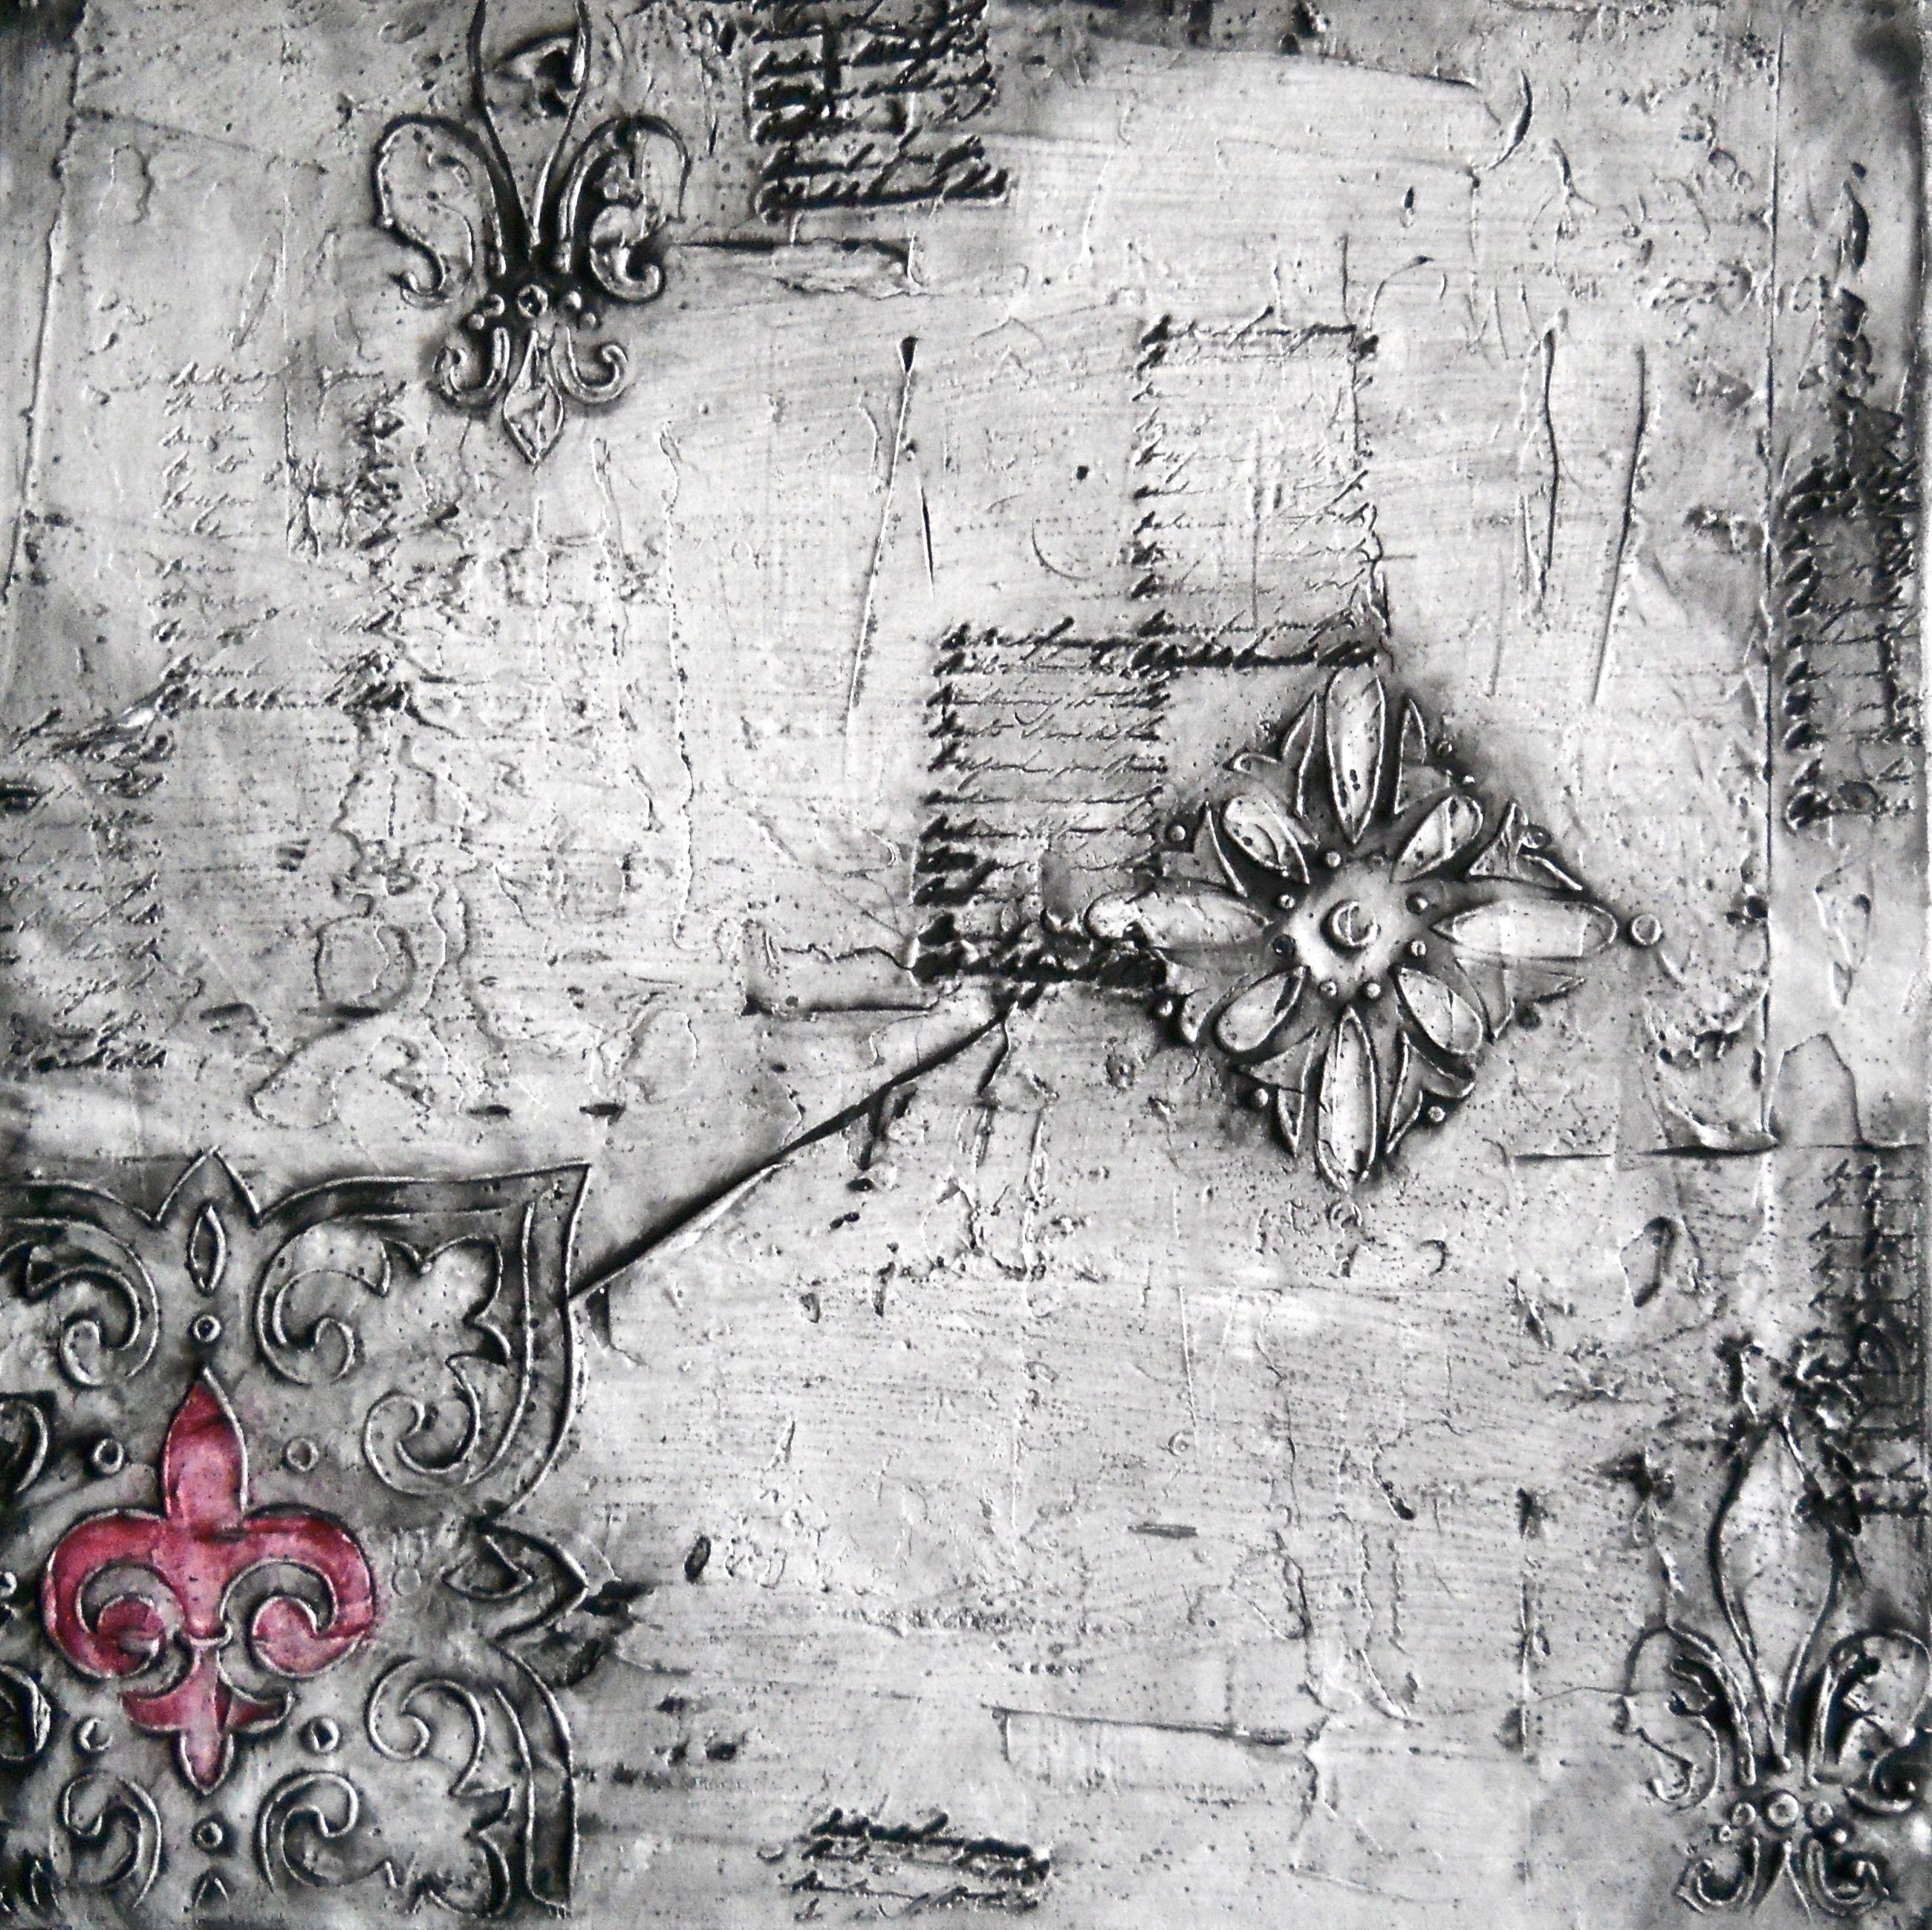 Textured Series III Abstract Art Original Painting Textured Mixed